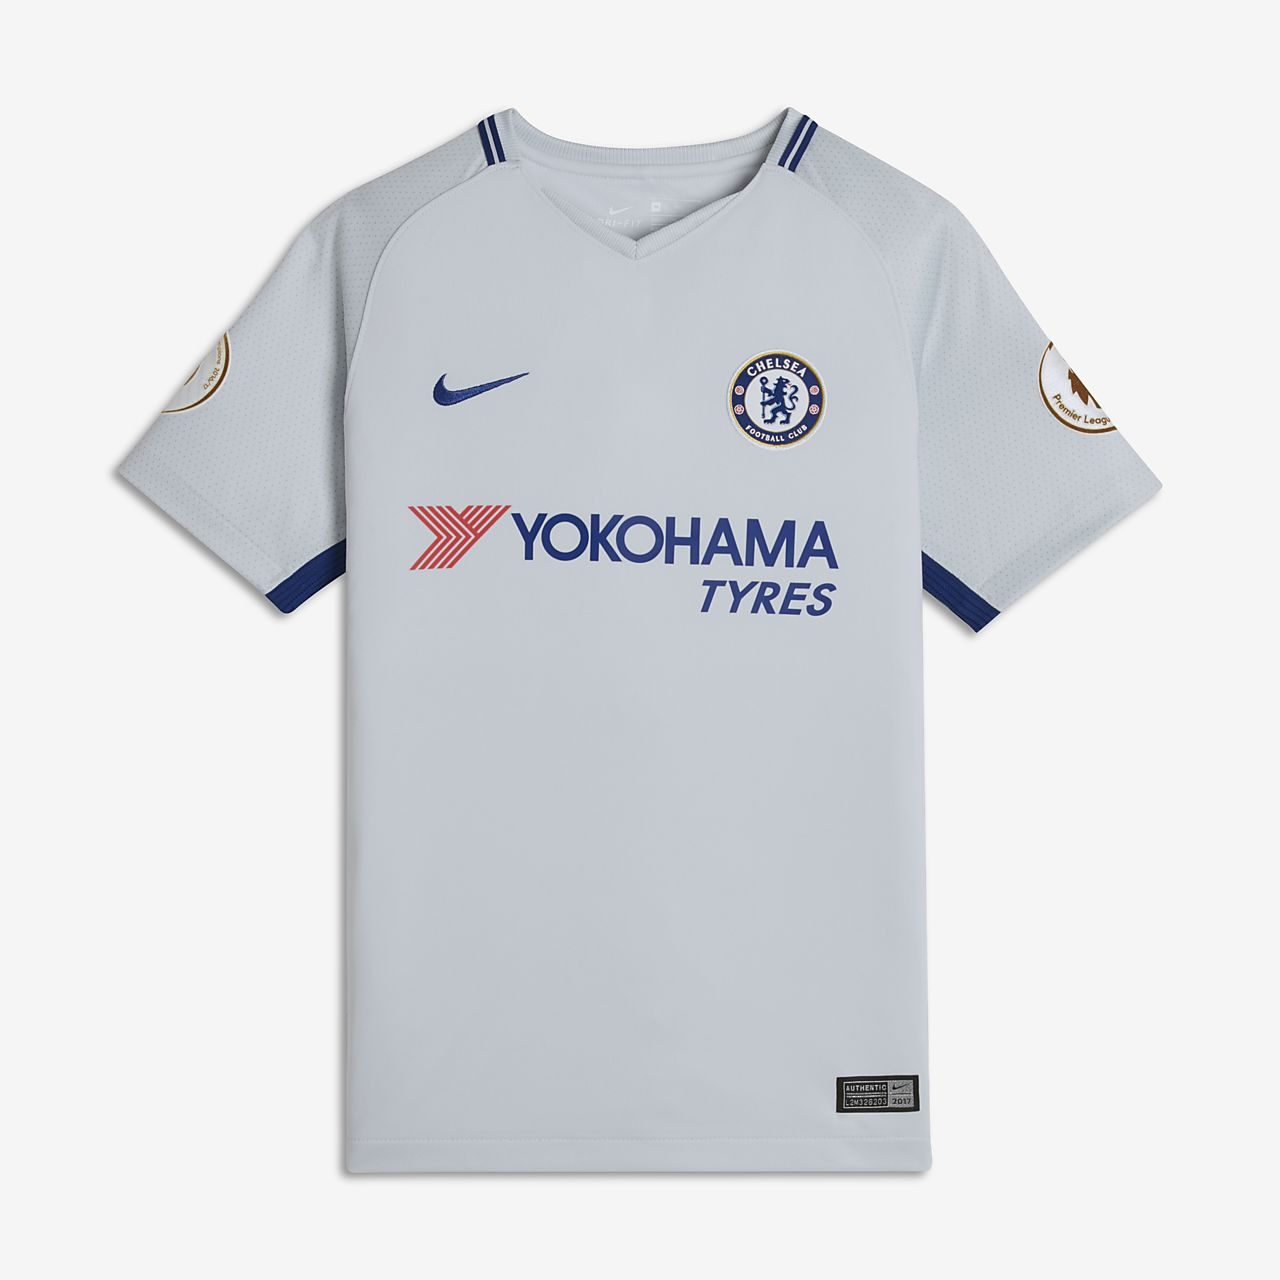 2017/18 Chelsea FC Stadium Away (Alvaro Morata) Fußballtrikot für ältere Kinder